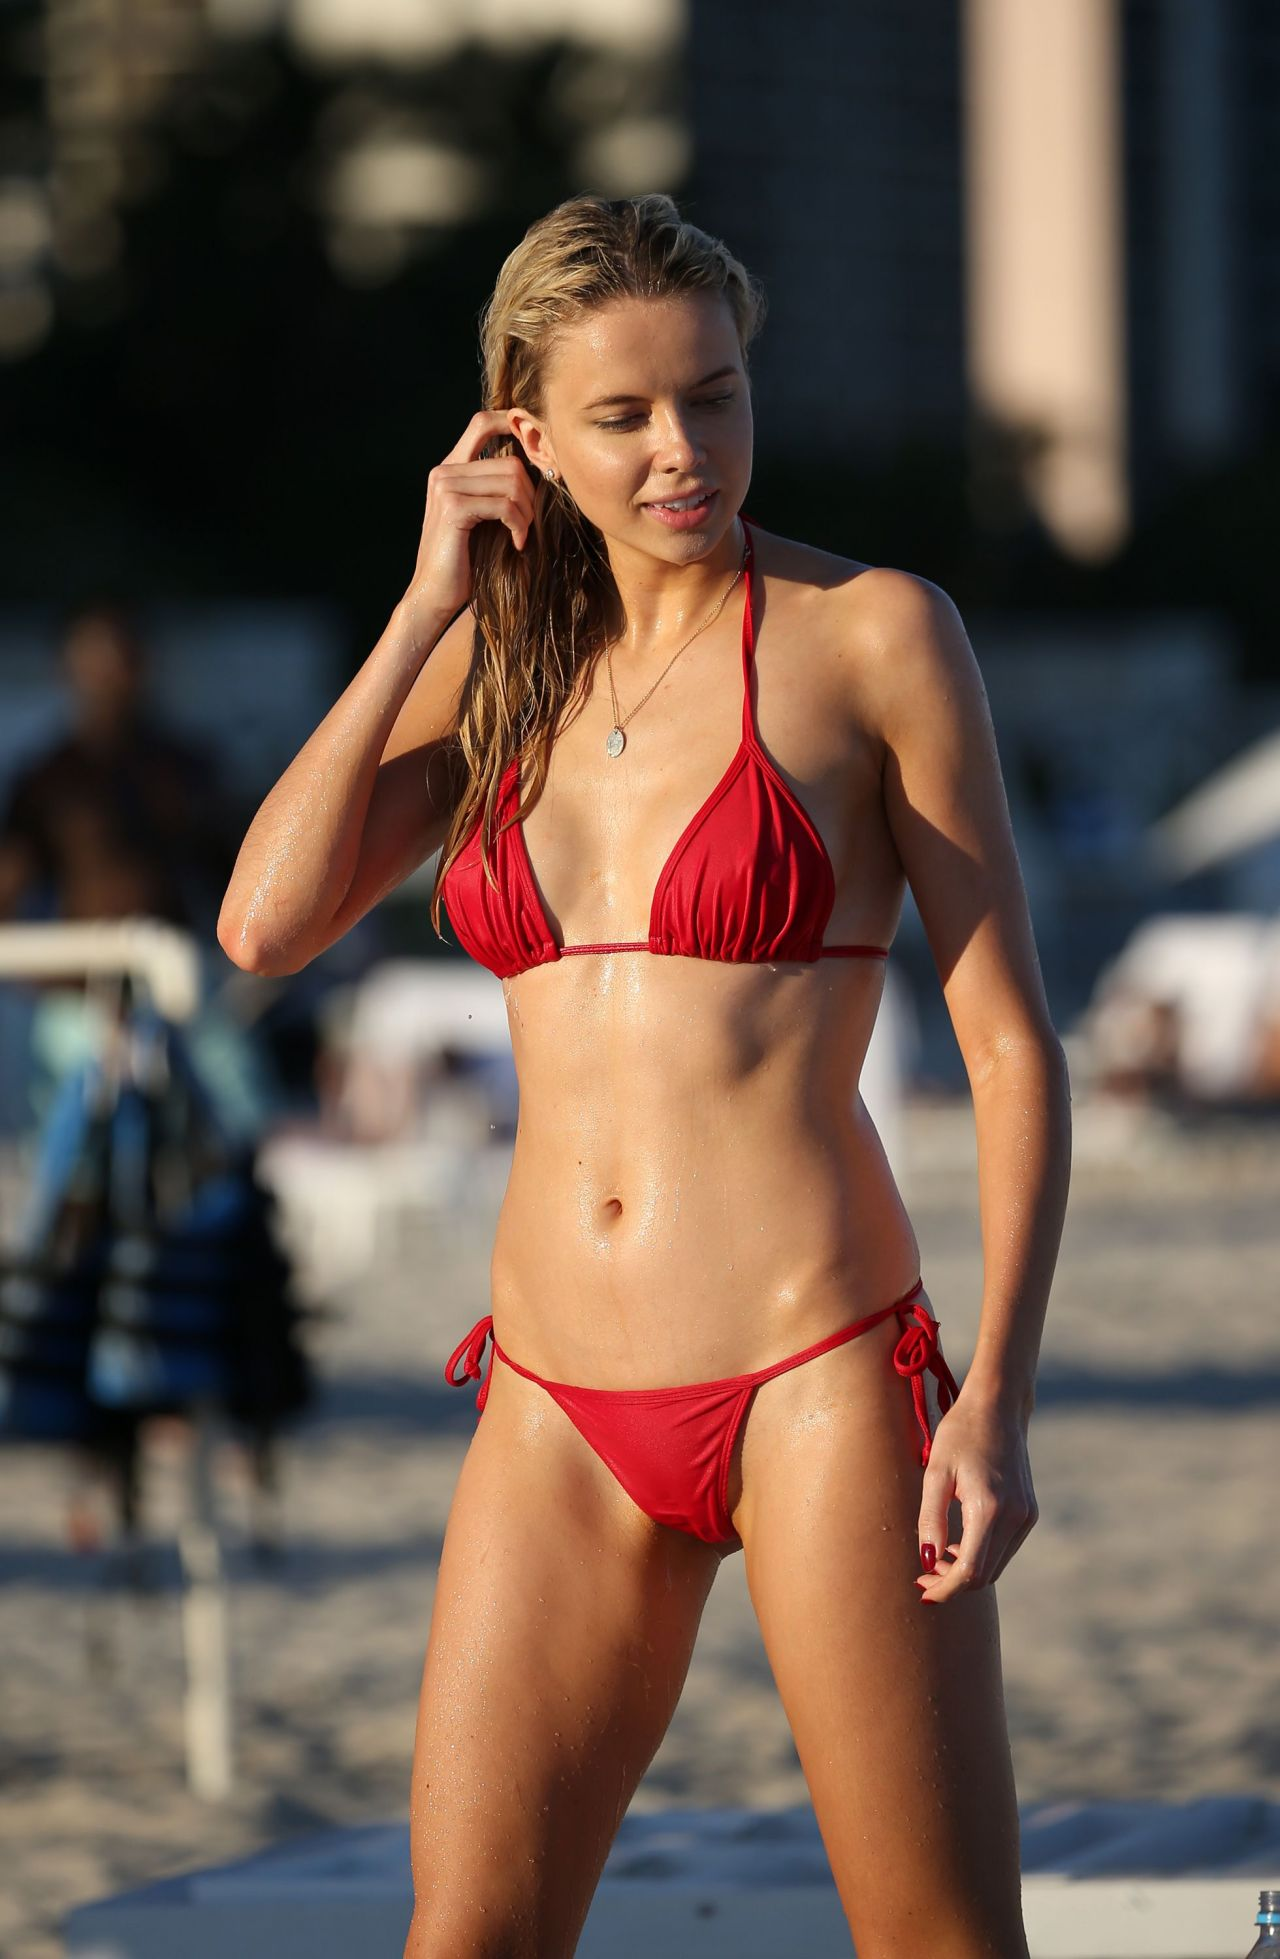 Bikini Samantha Jade naked (93 pics), Paparazzi